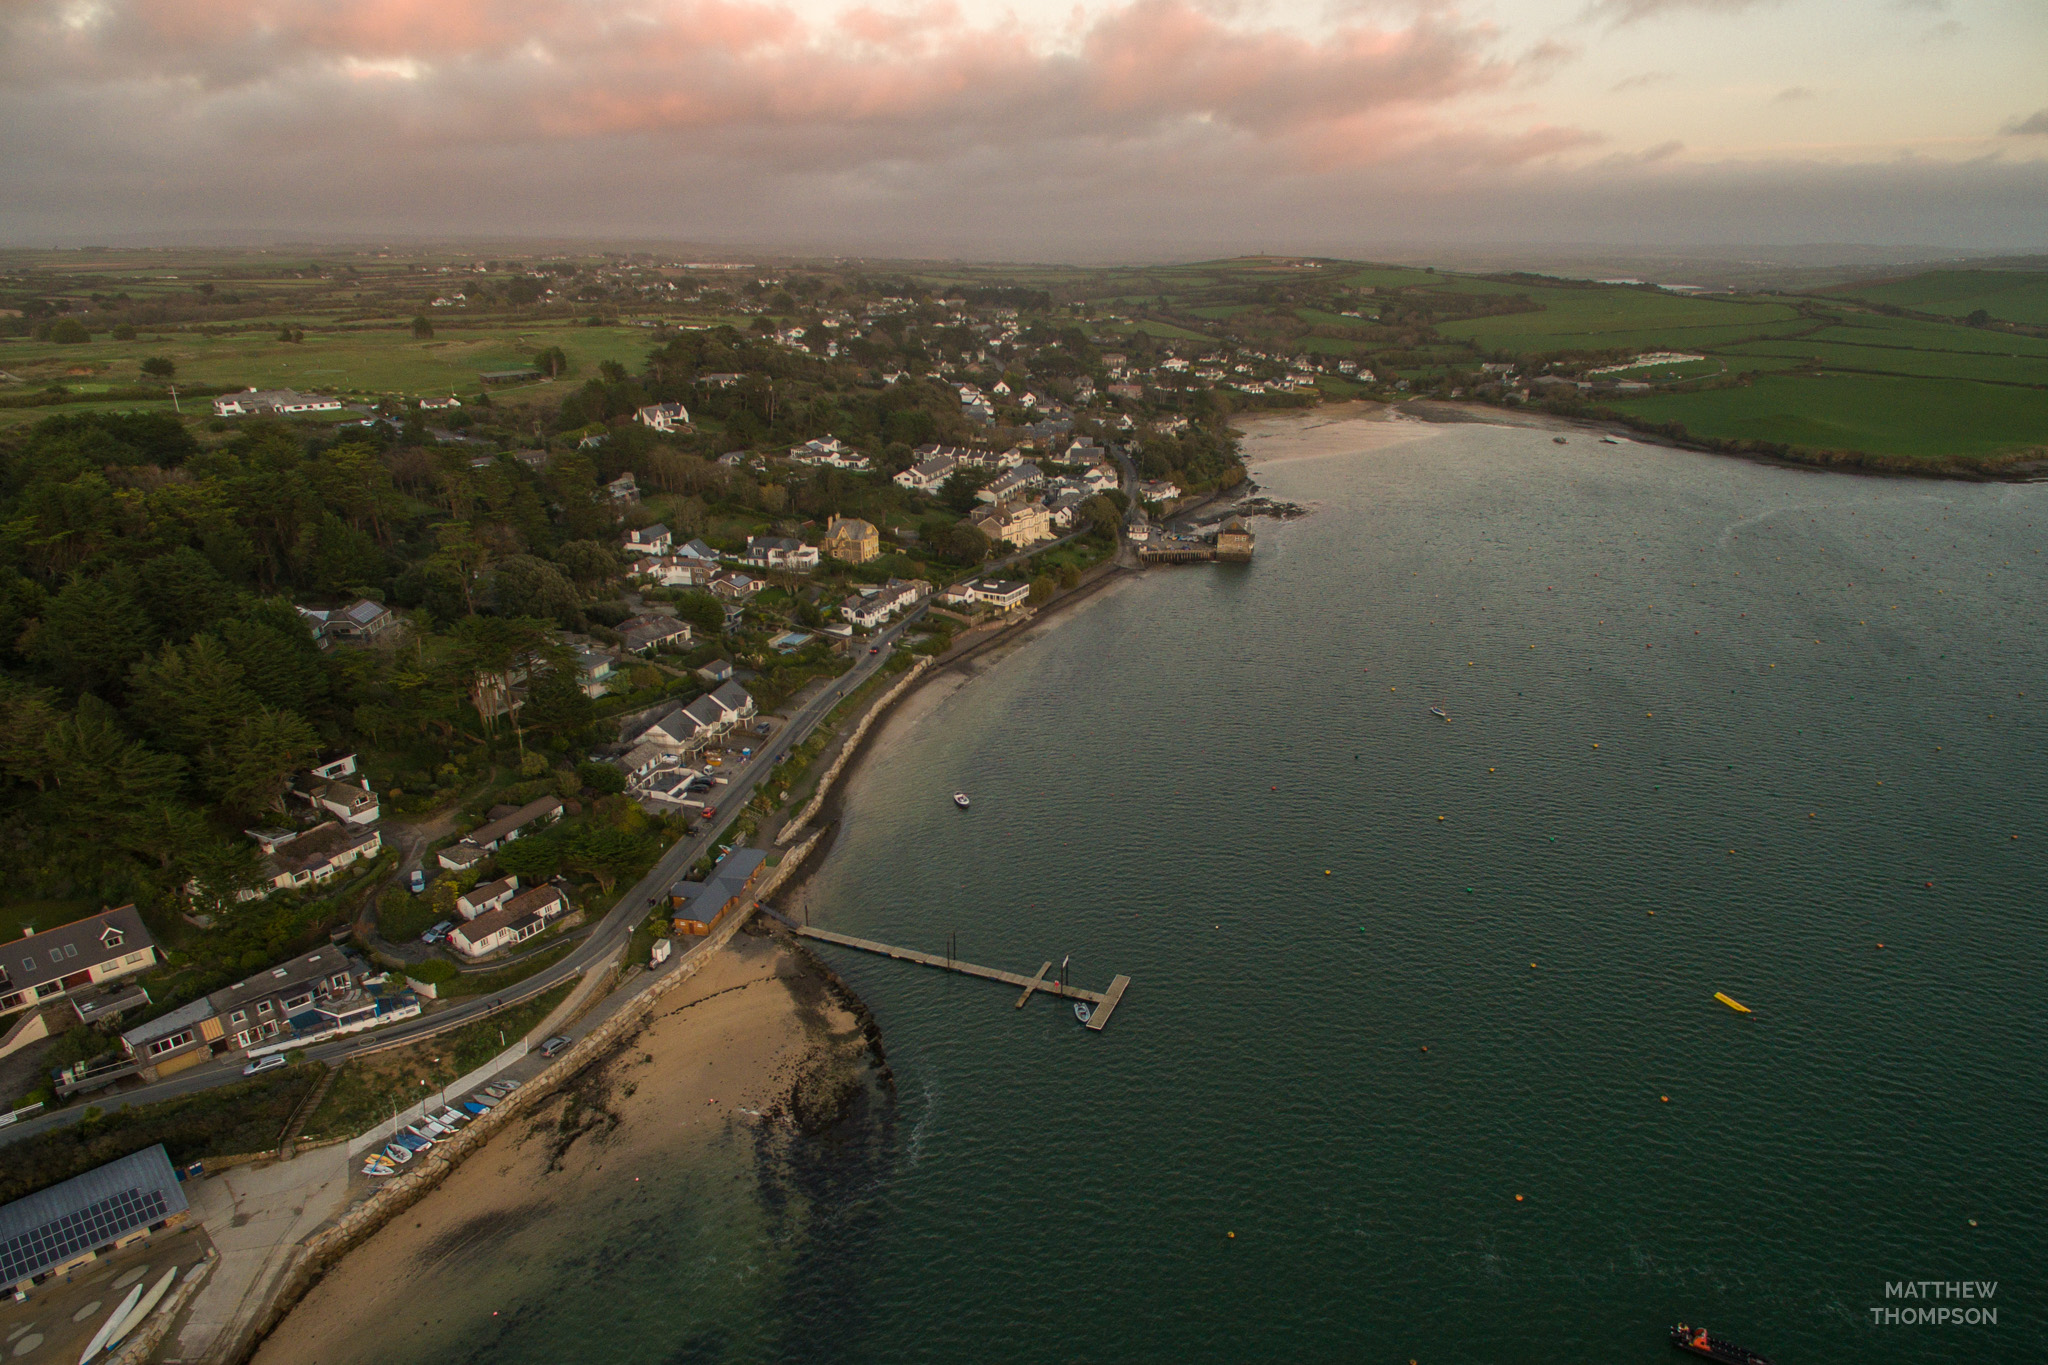 151107-Cornwall-Aerial-47-W.jpg